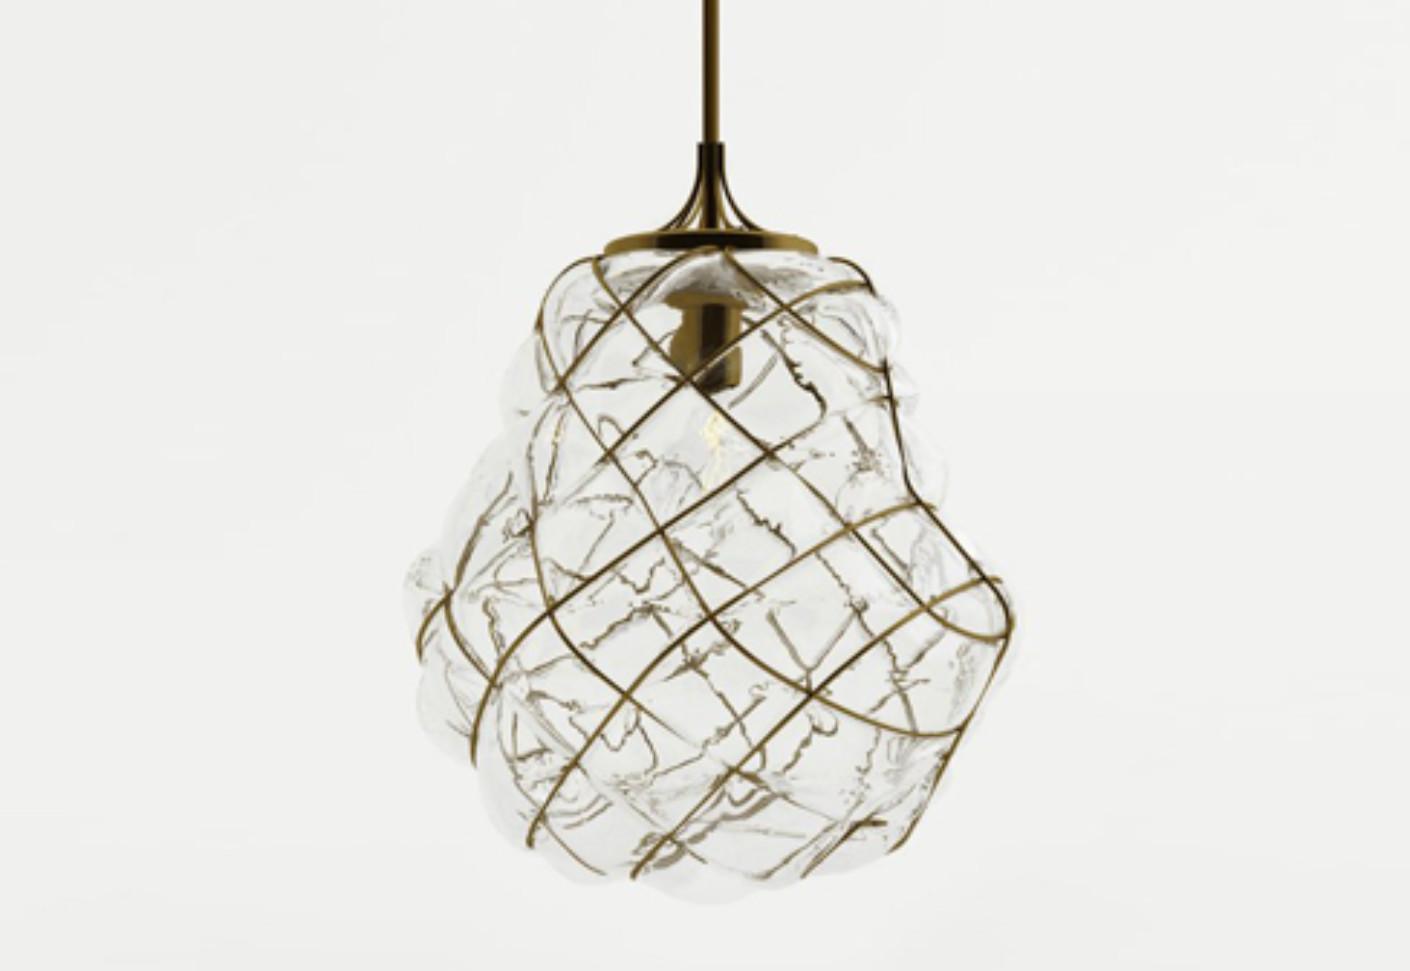 Lantern Pendant By MATTER